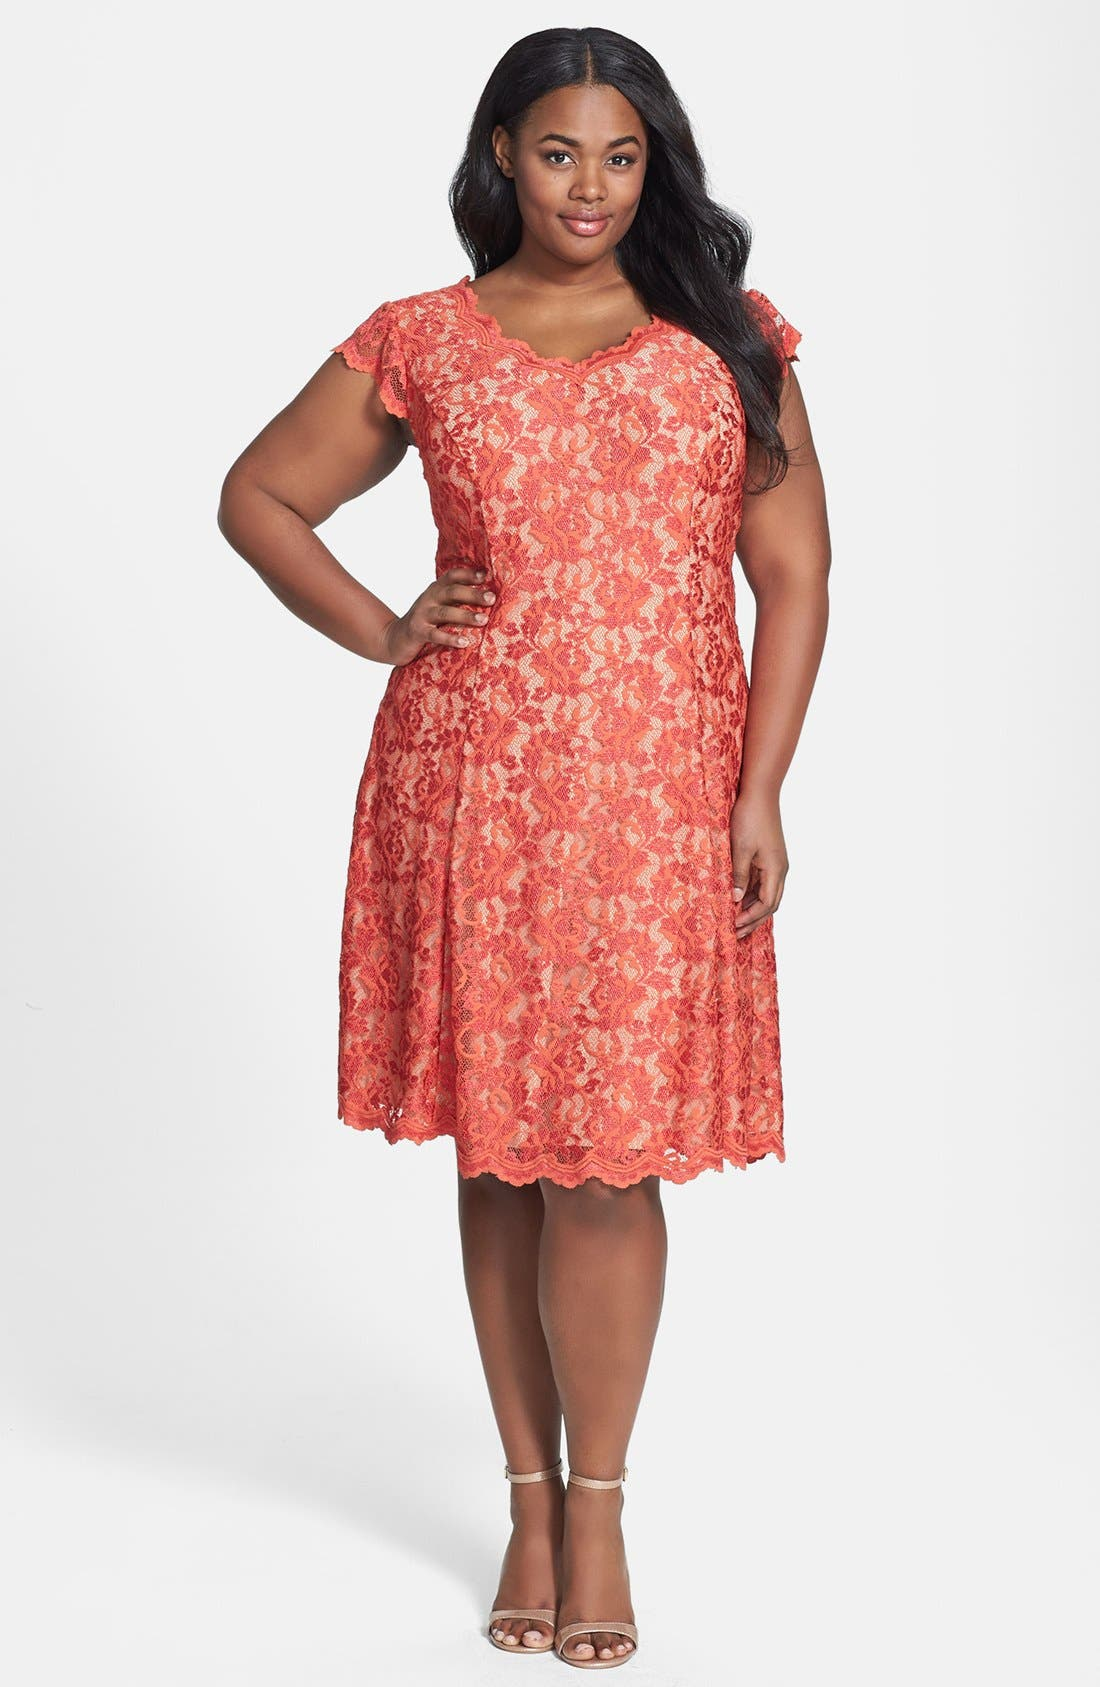 Main Image - ABS by Allen Schwartz Lace Fit & Flare Dress (Plus Size)